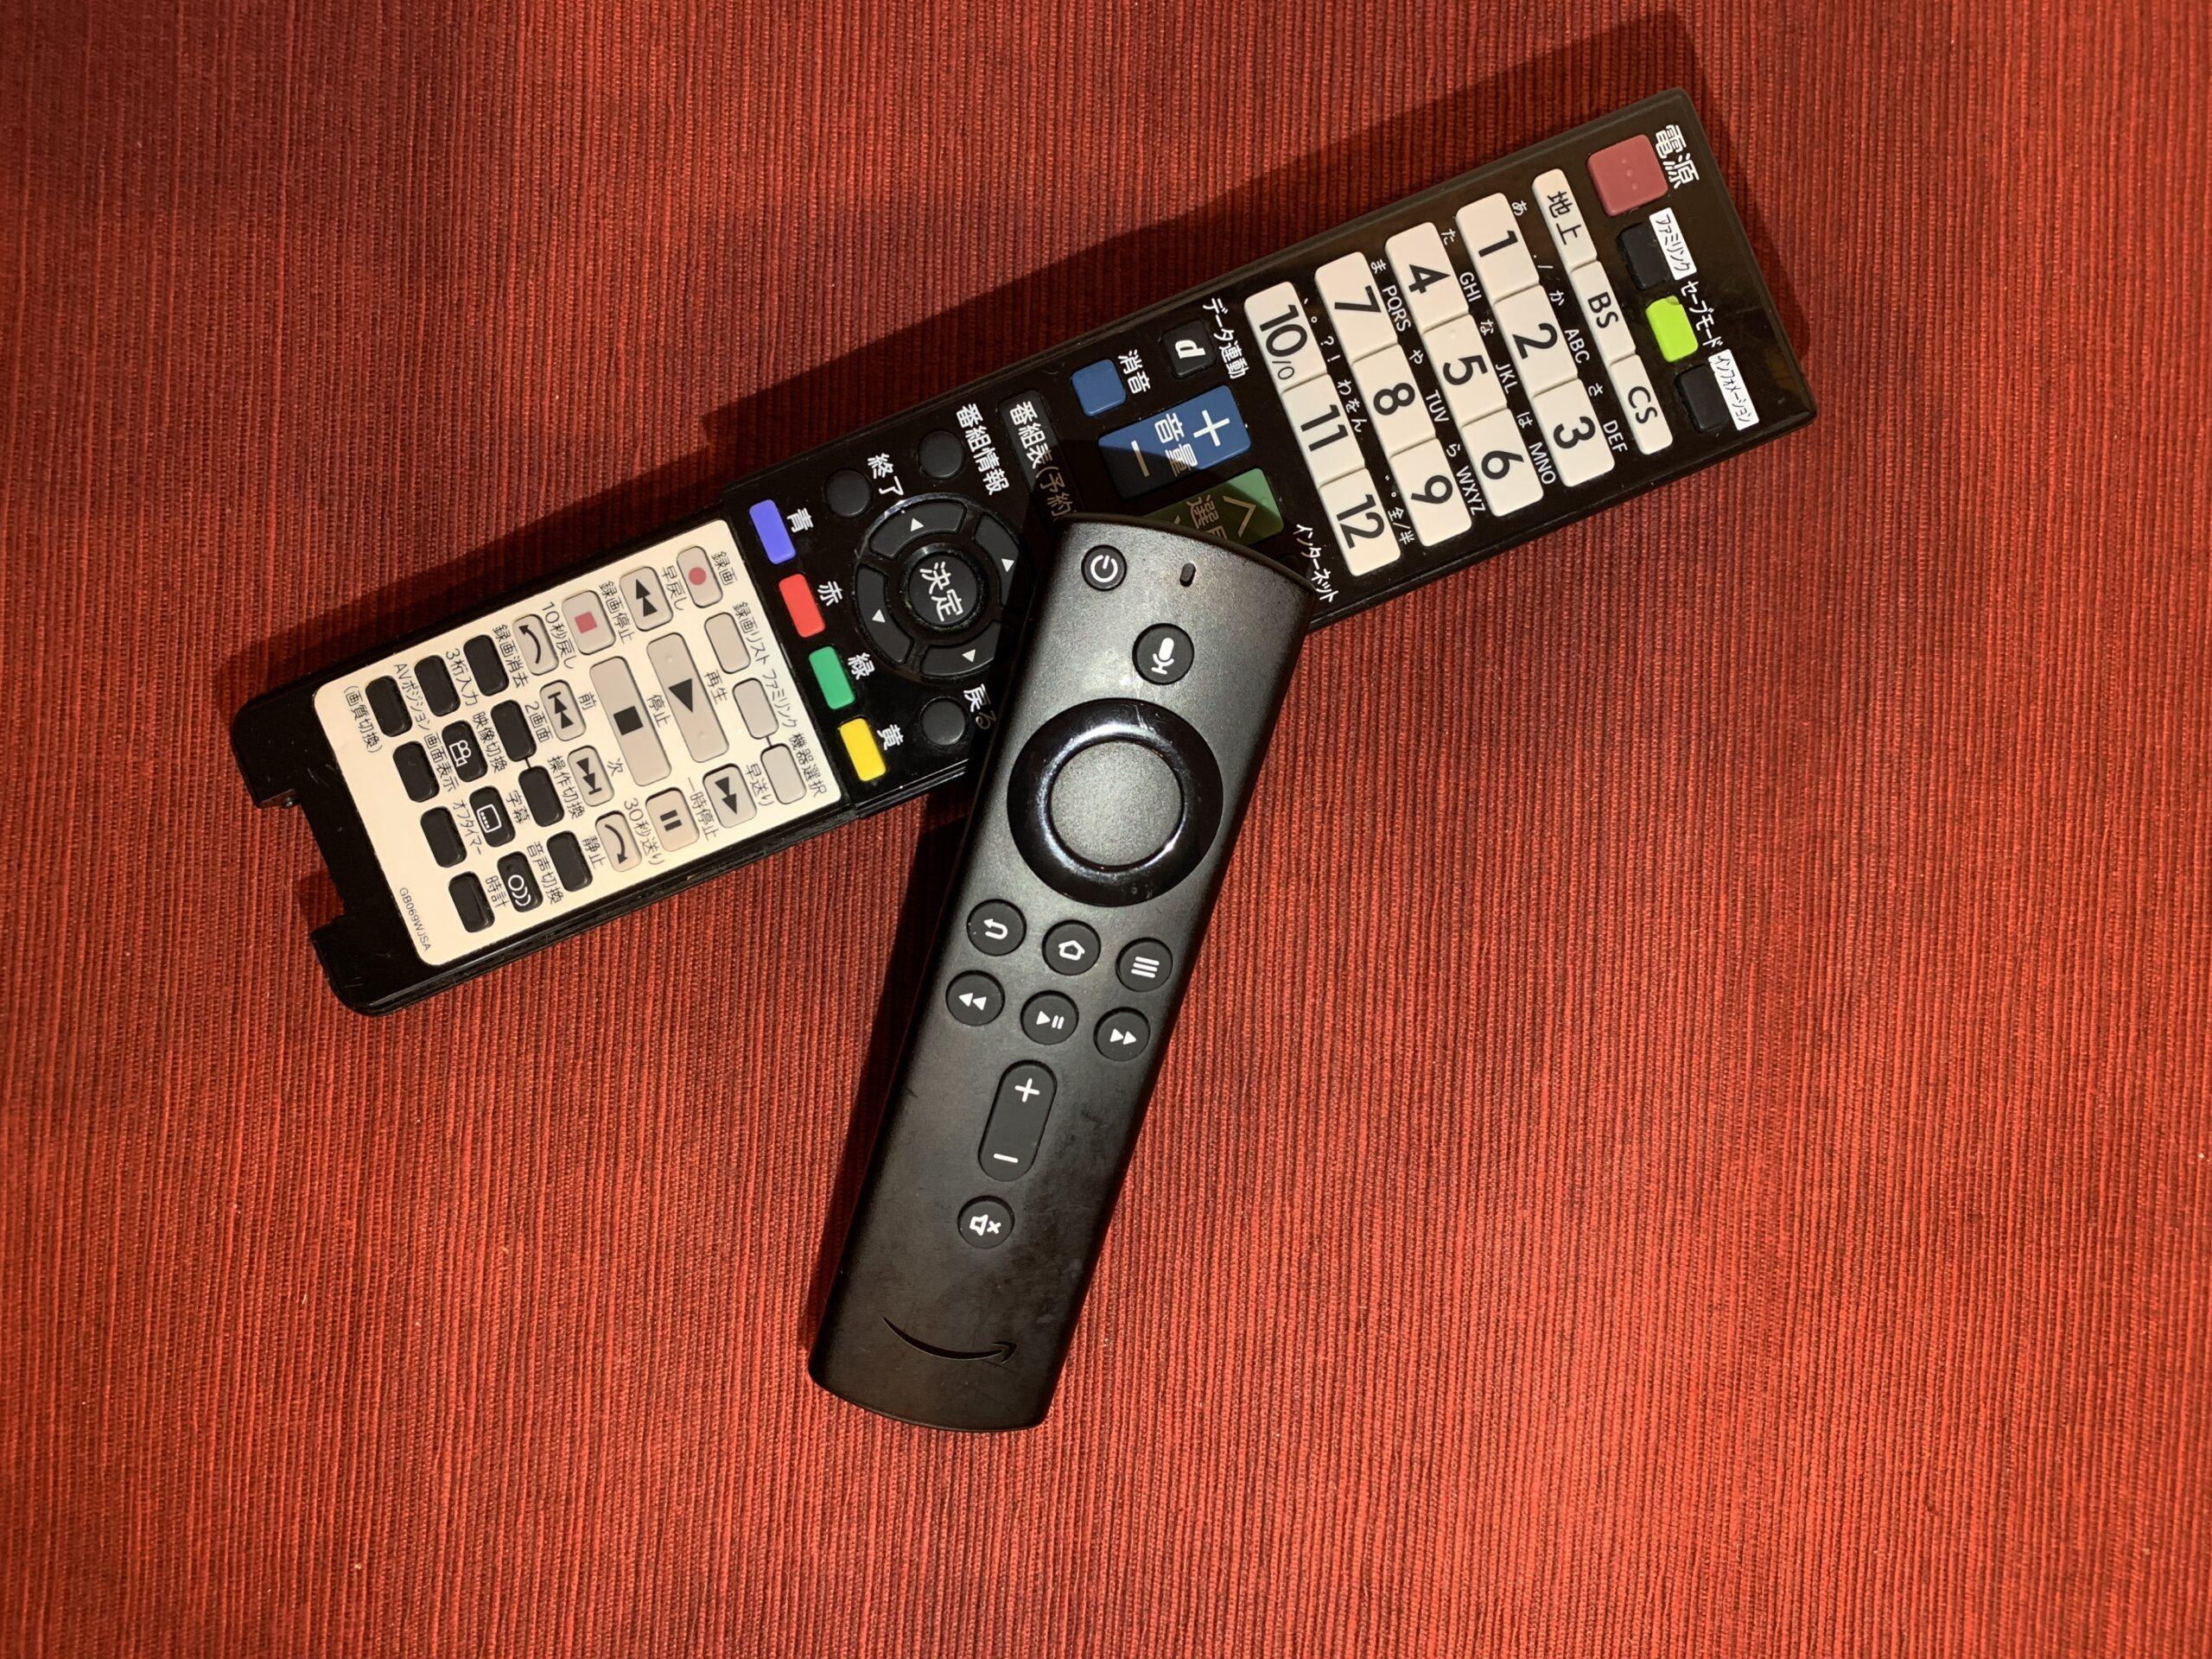 Fire TV Stickを繋げるとテレビリモコンが動かない?対処法